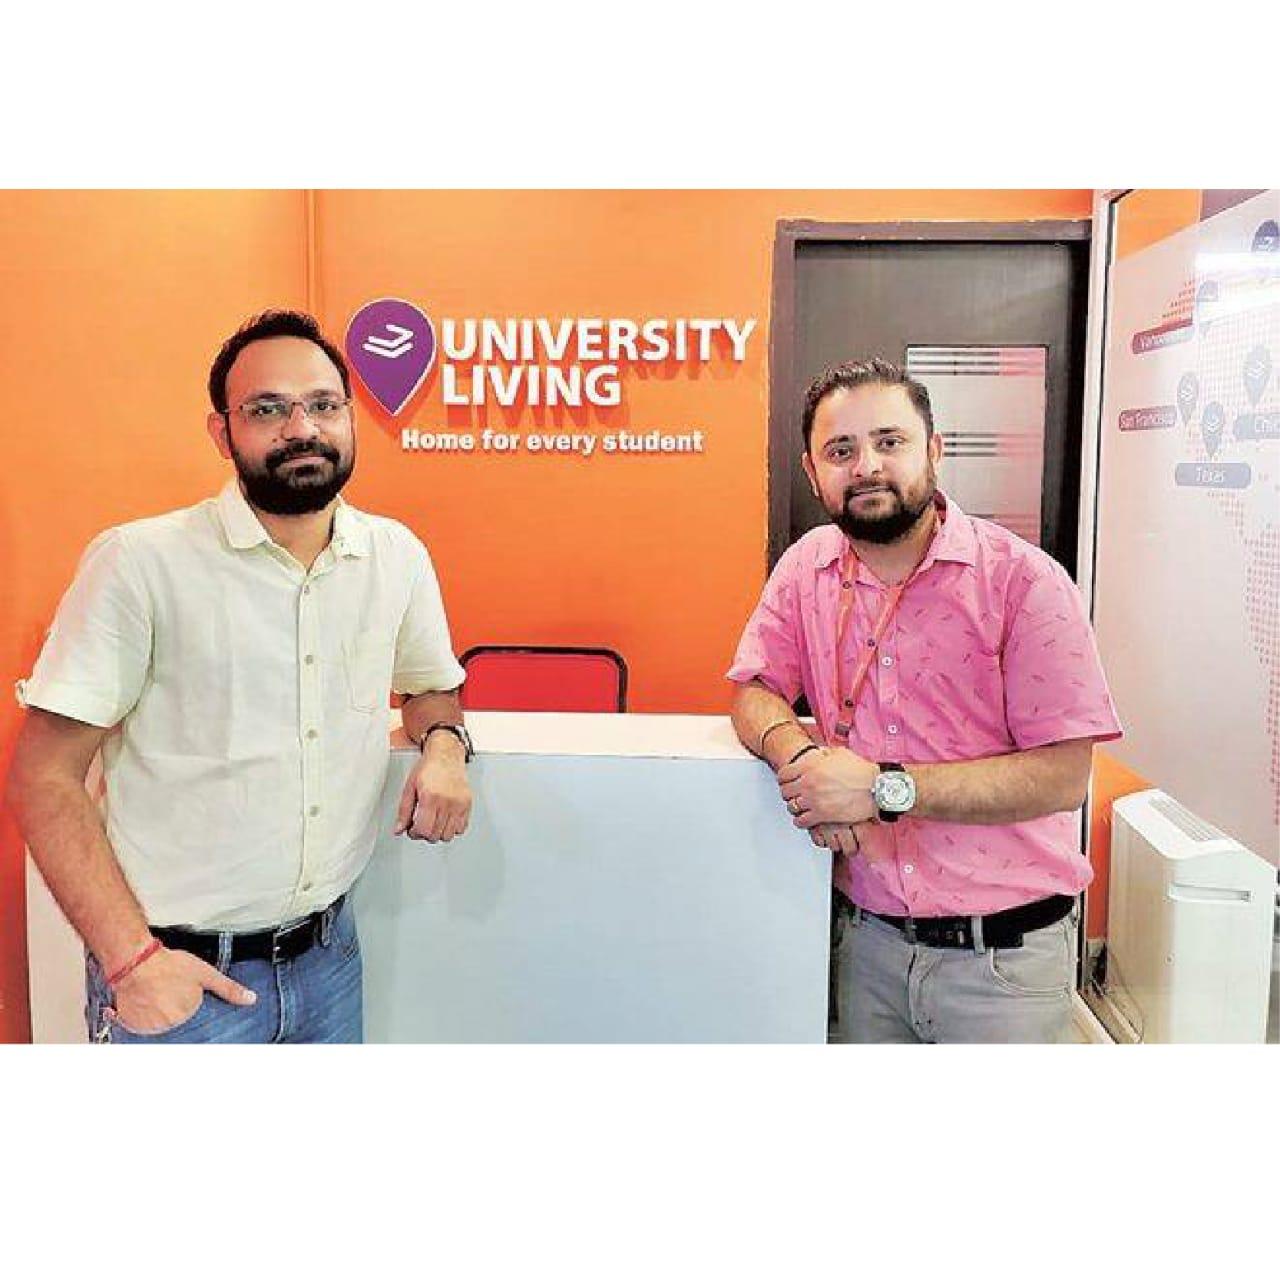 University Living